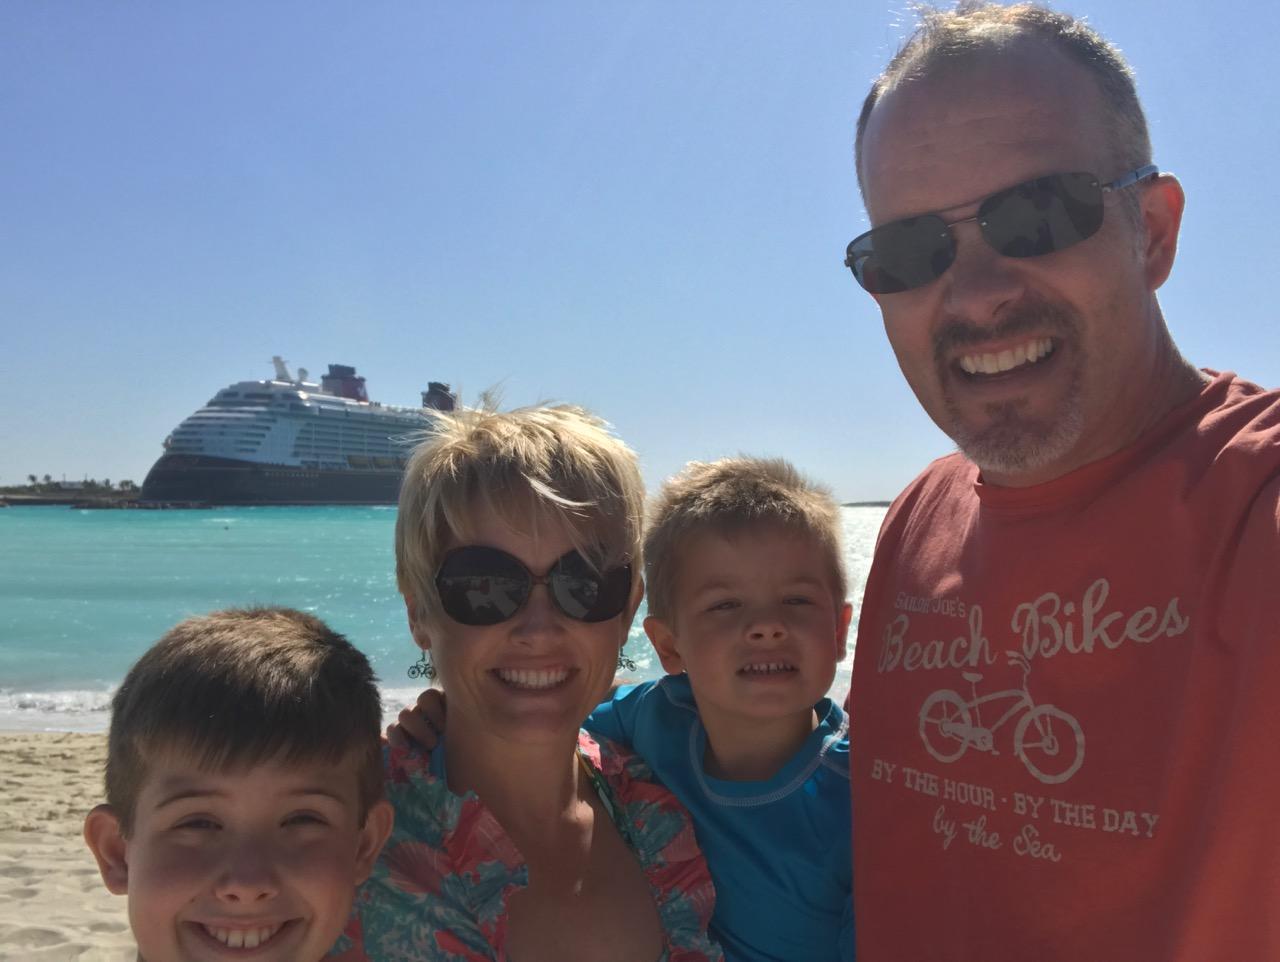 Disney Dream Castaway Cay Beach Selfie